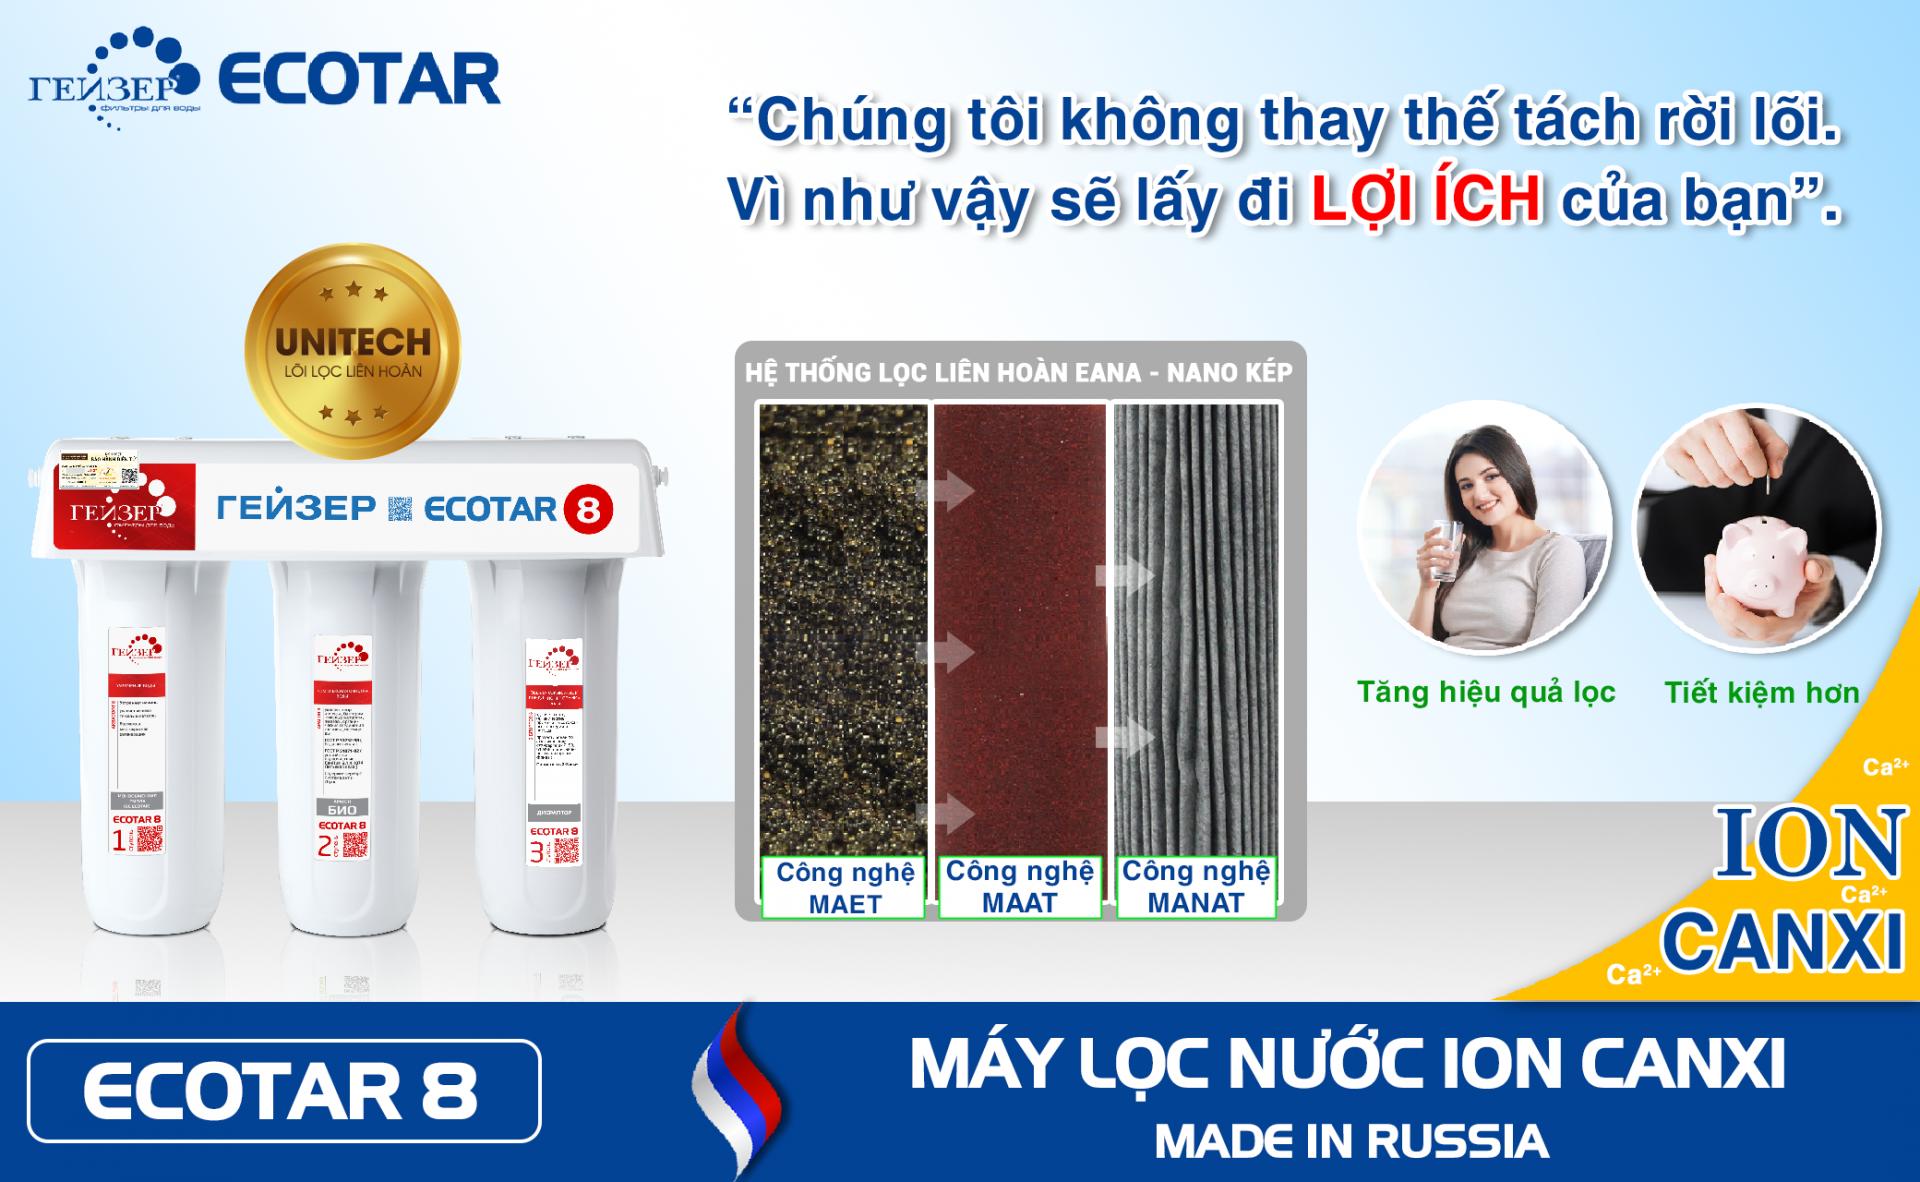 He Thong Loi Loc Lien Hoan 1 2